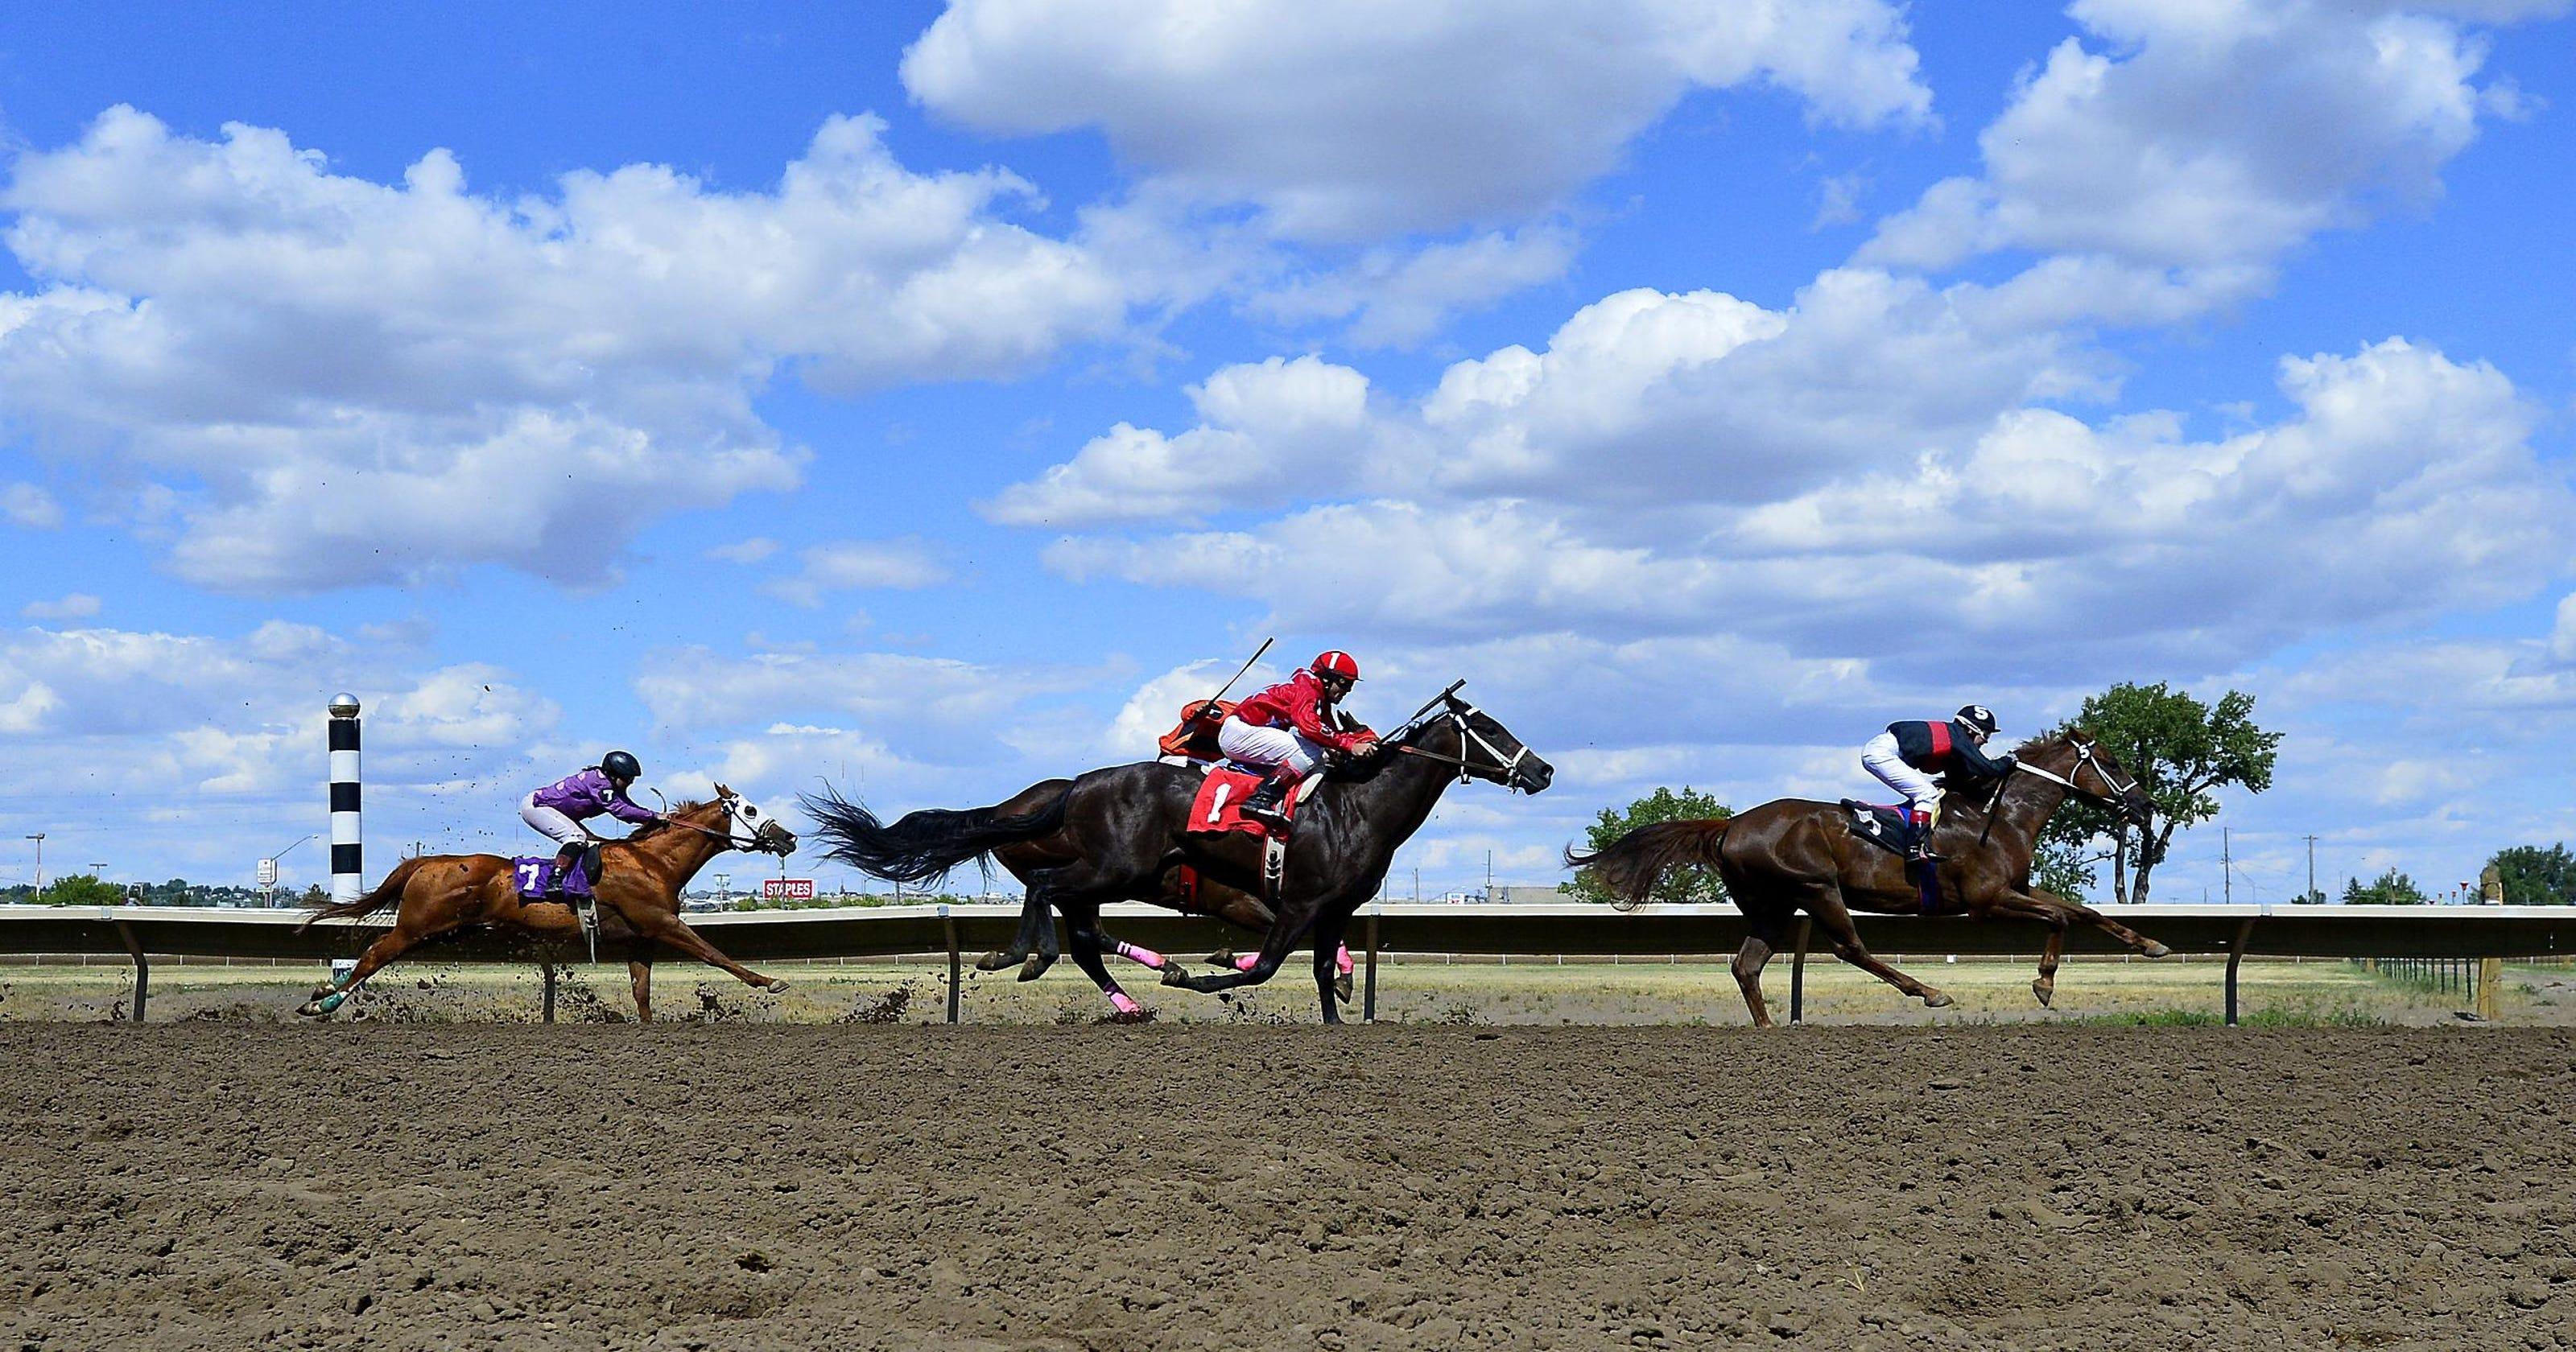 Scoreboard: Horse racing overnights, rodeo, baseball